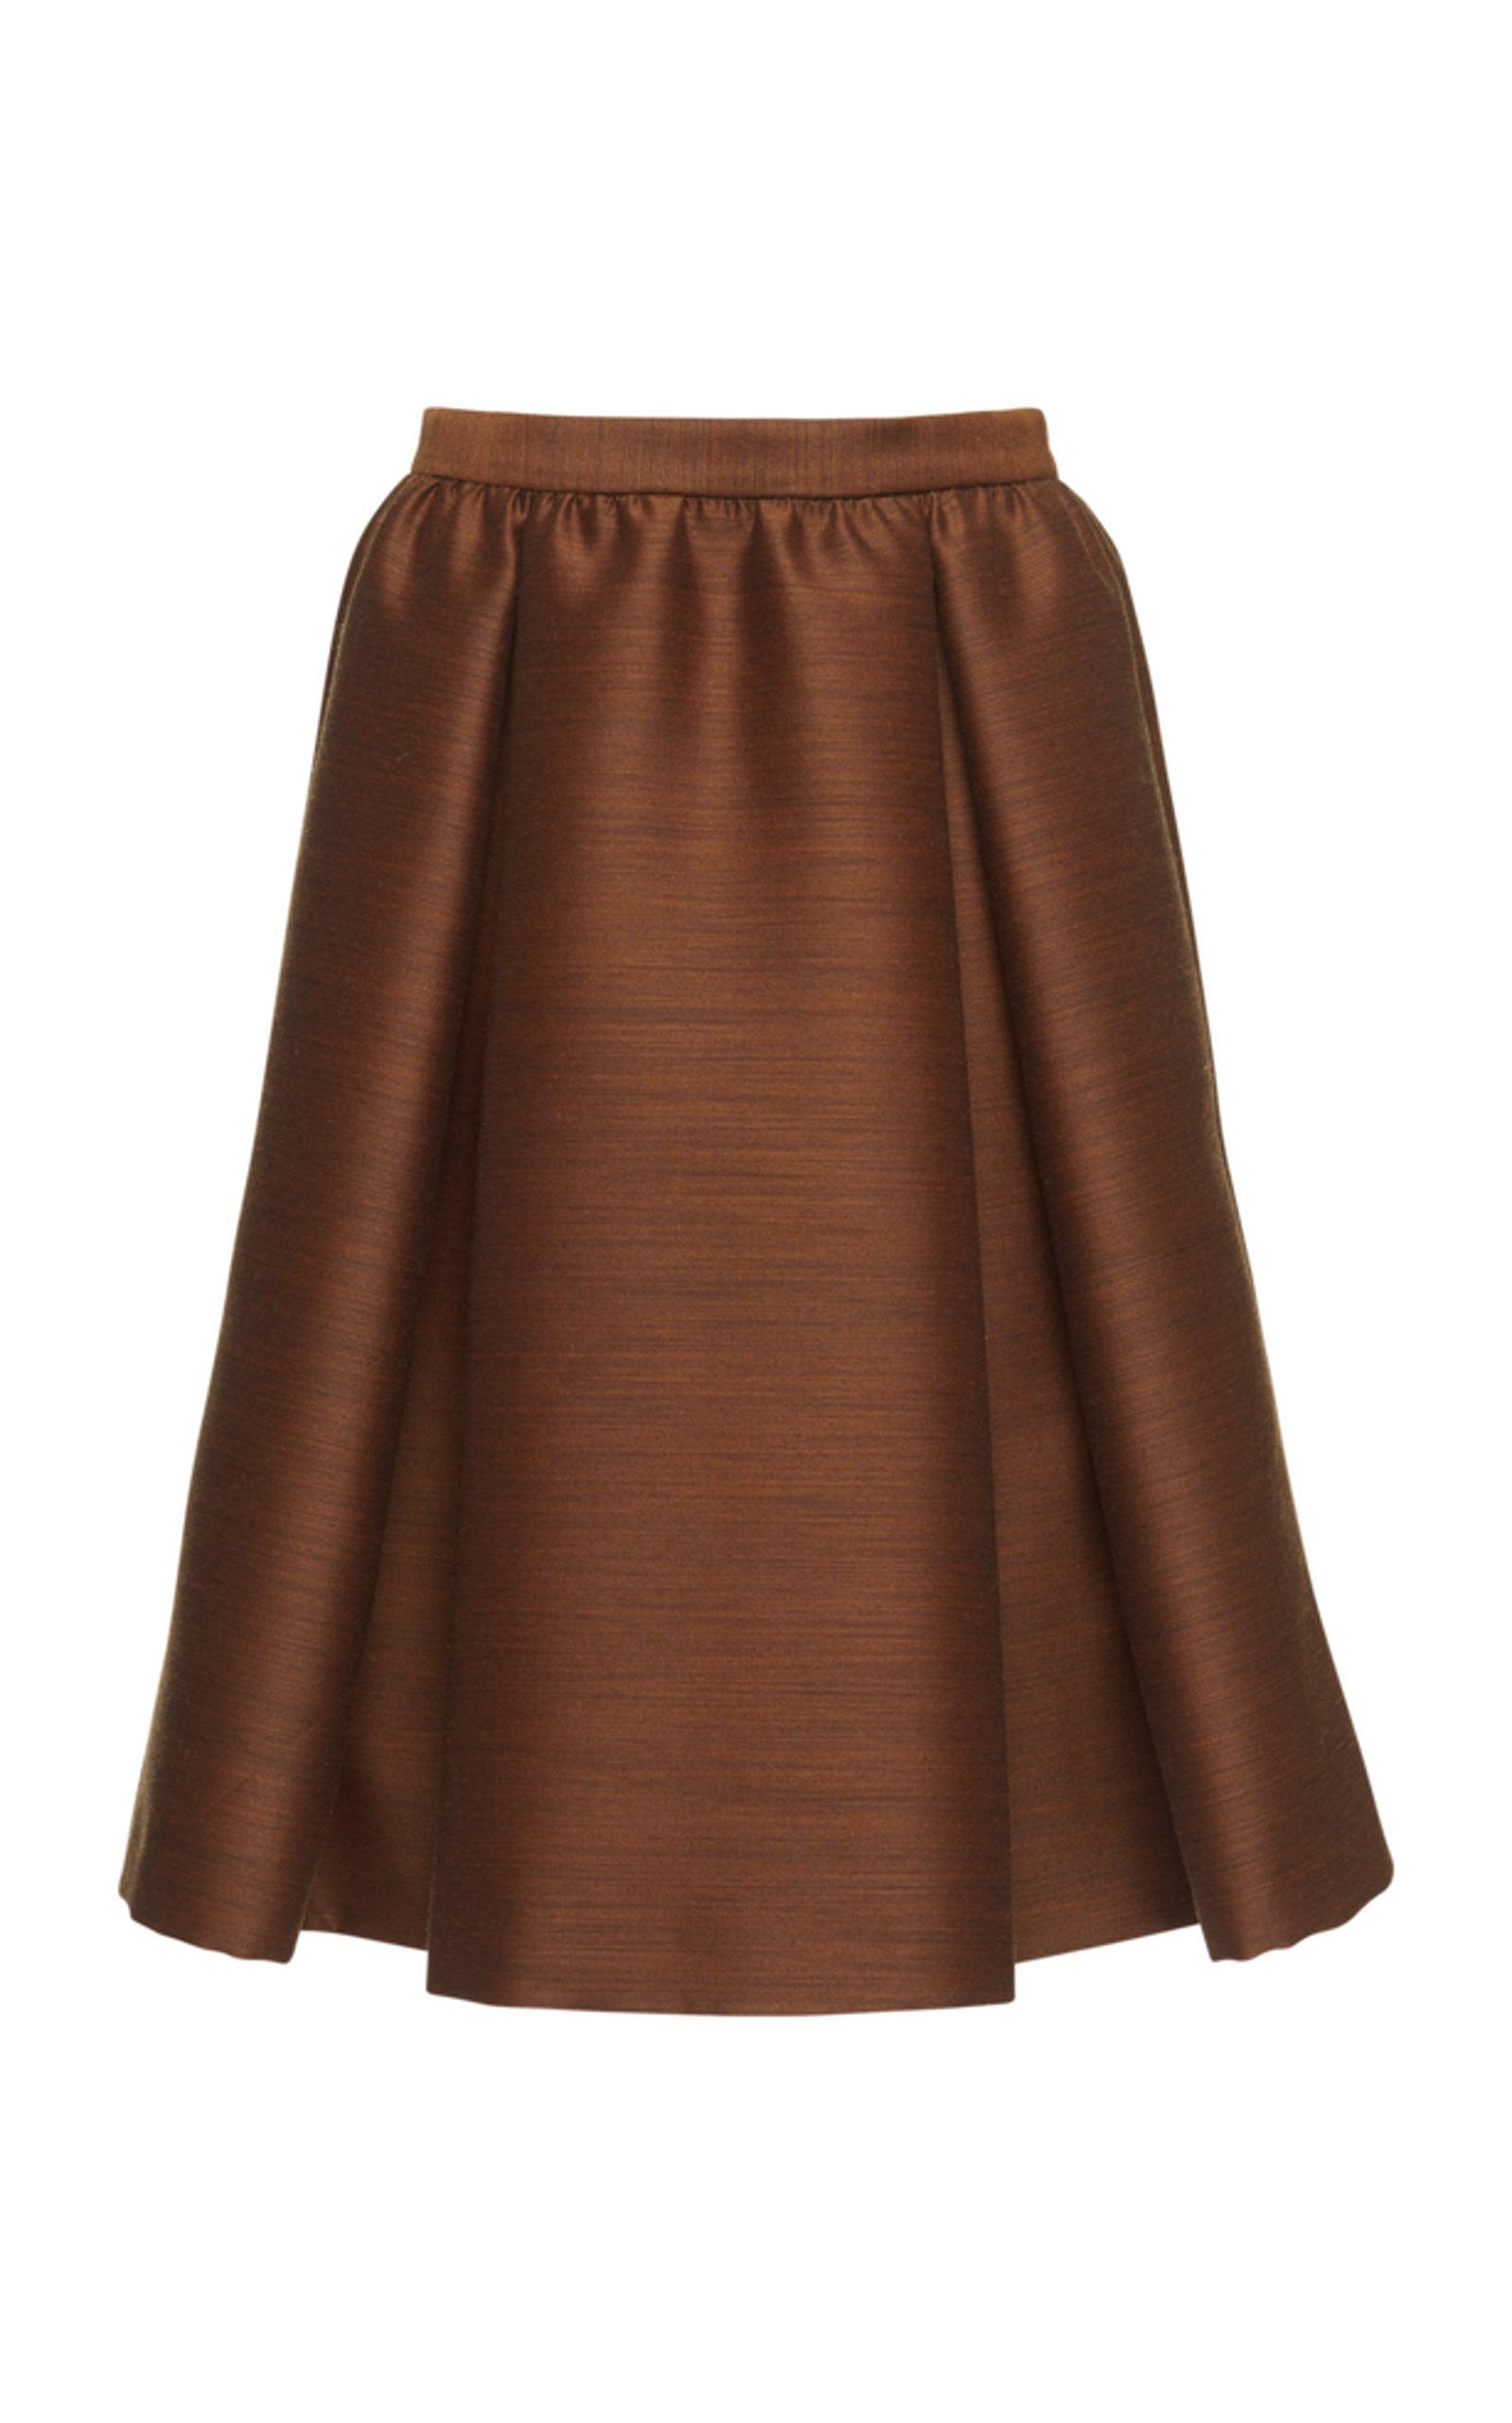 Bottega Veneta Skirts Draped A-line skirt